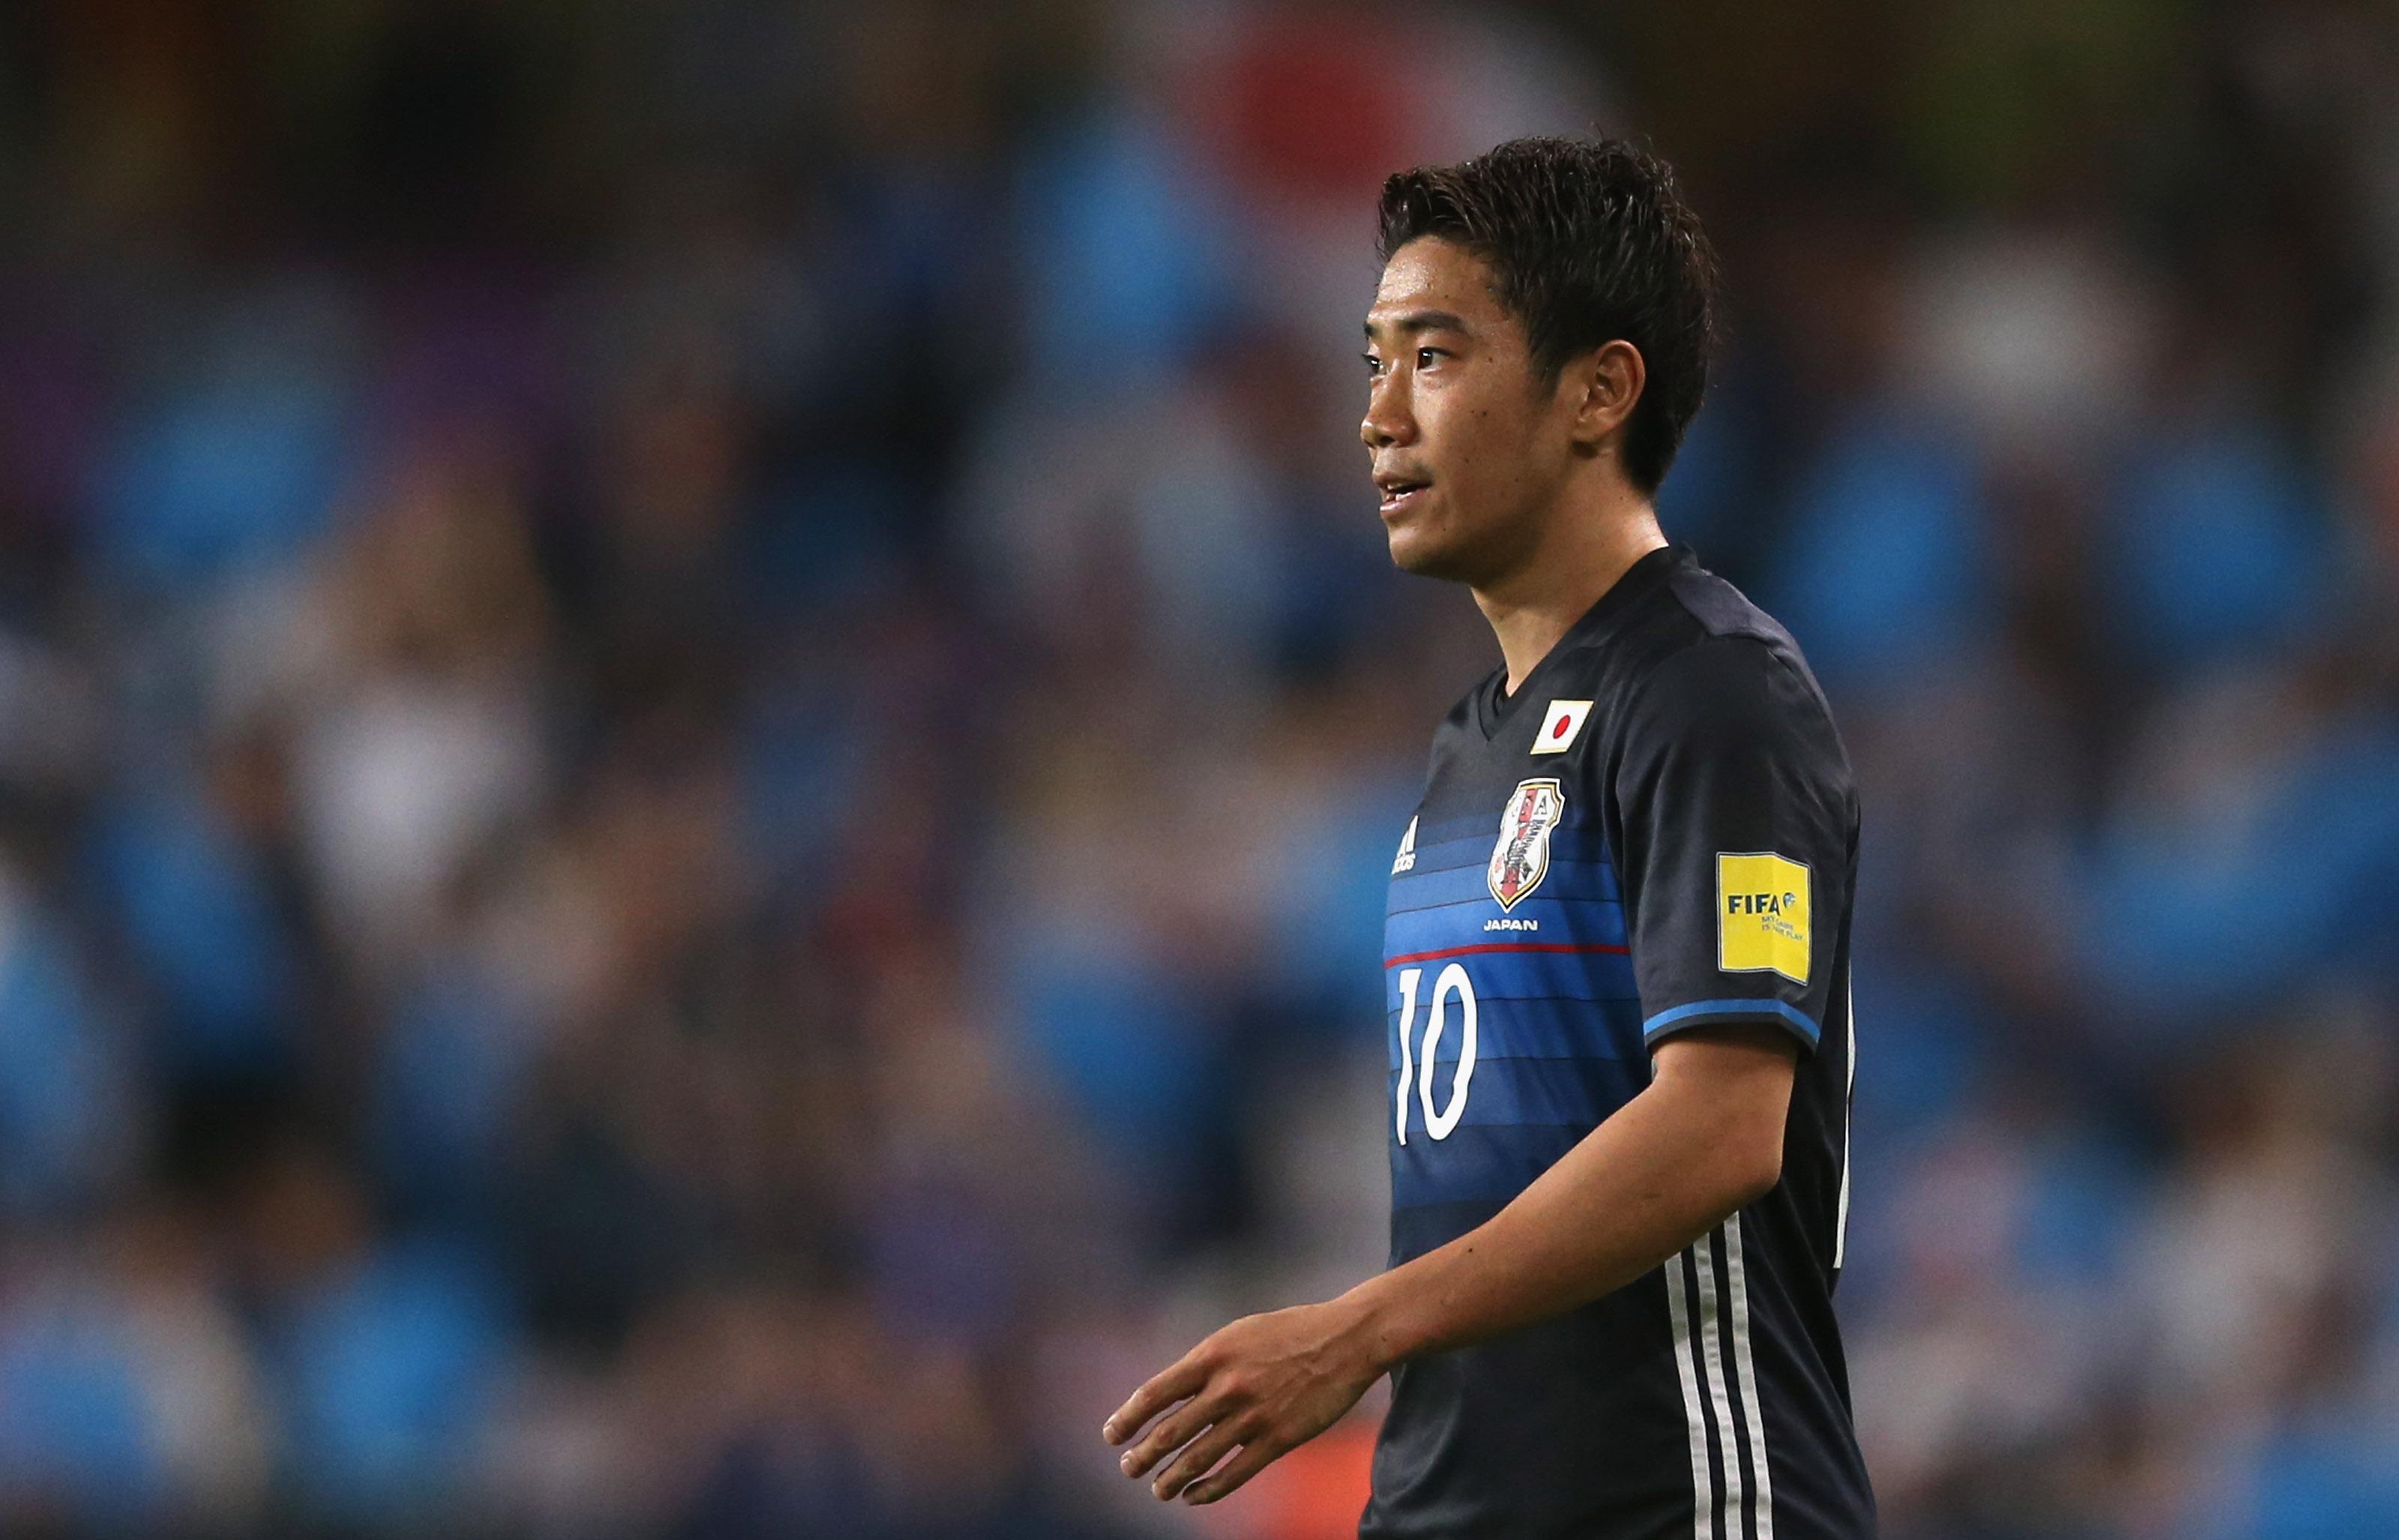 Borussia Dortmund s Kagawa Injured While Pulisic Shines for The